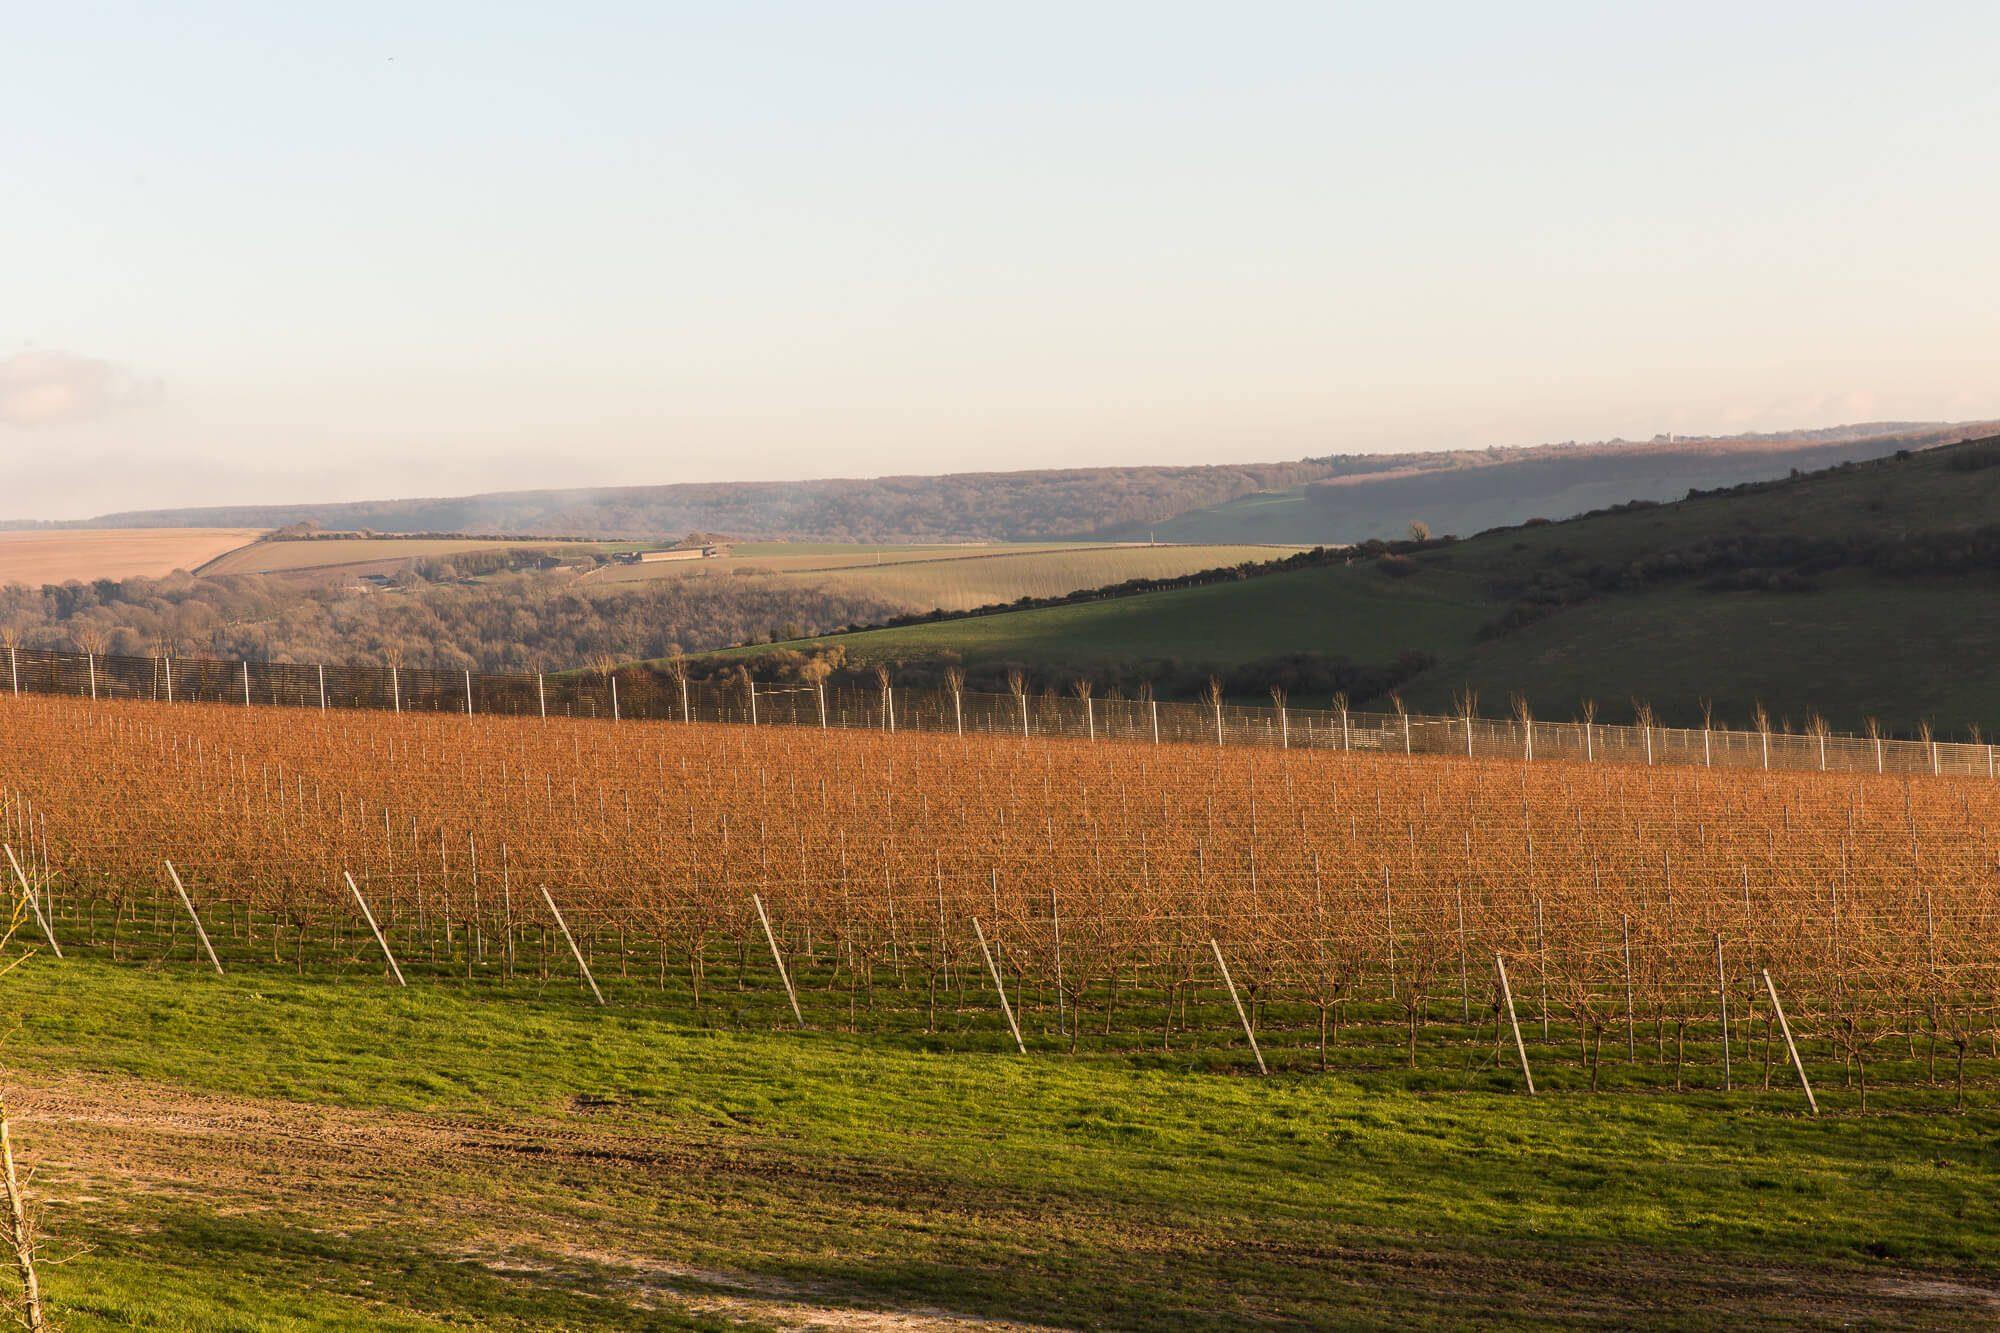 Morning Sun on the Vineyard